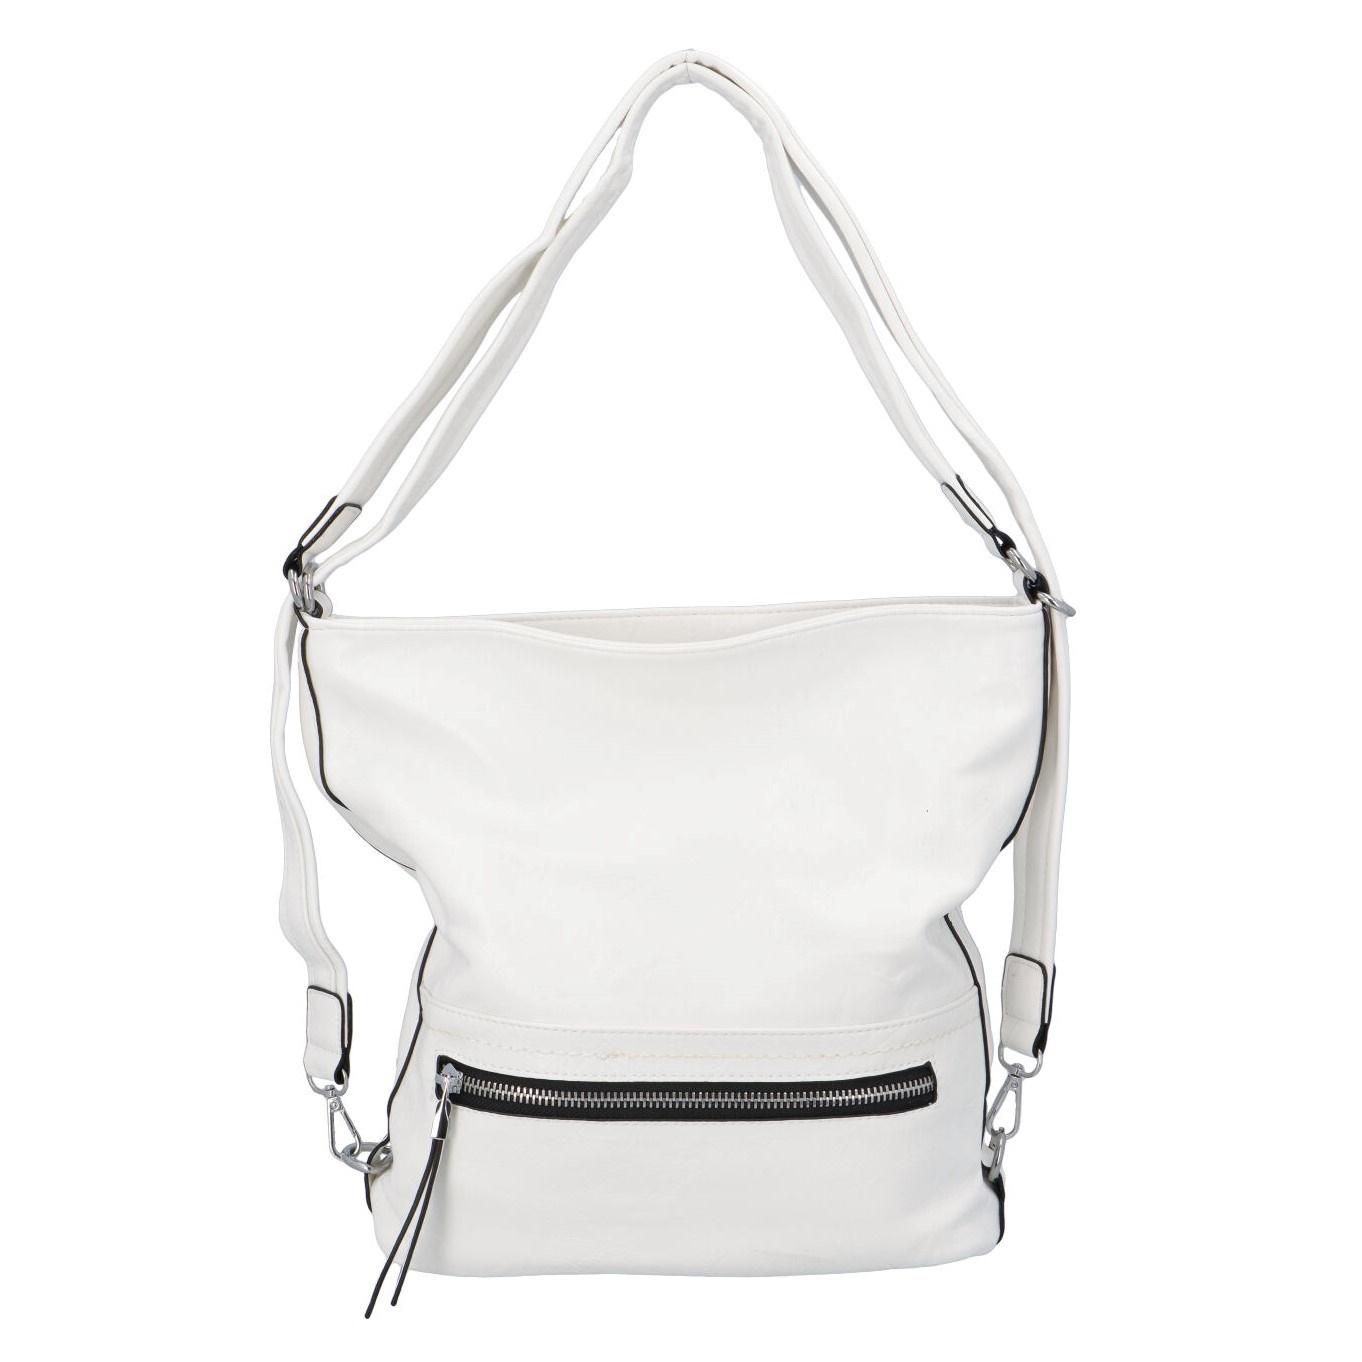 Dámska kabelka batoh biela - Romina Nikka